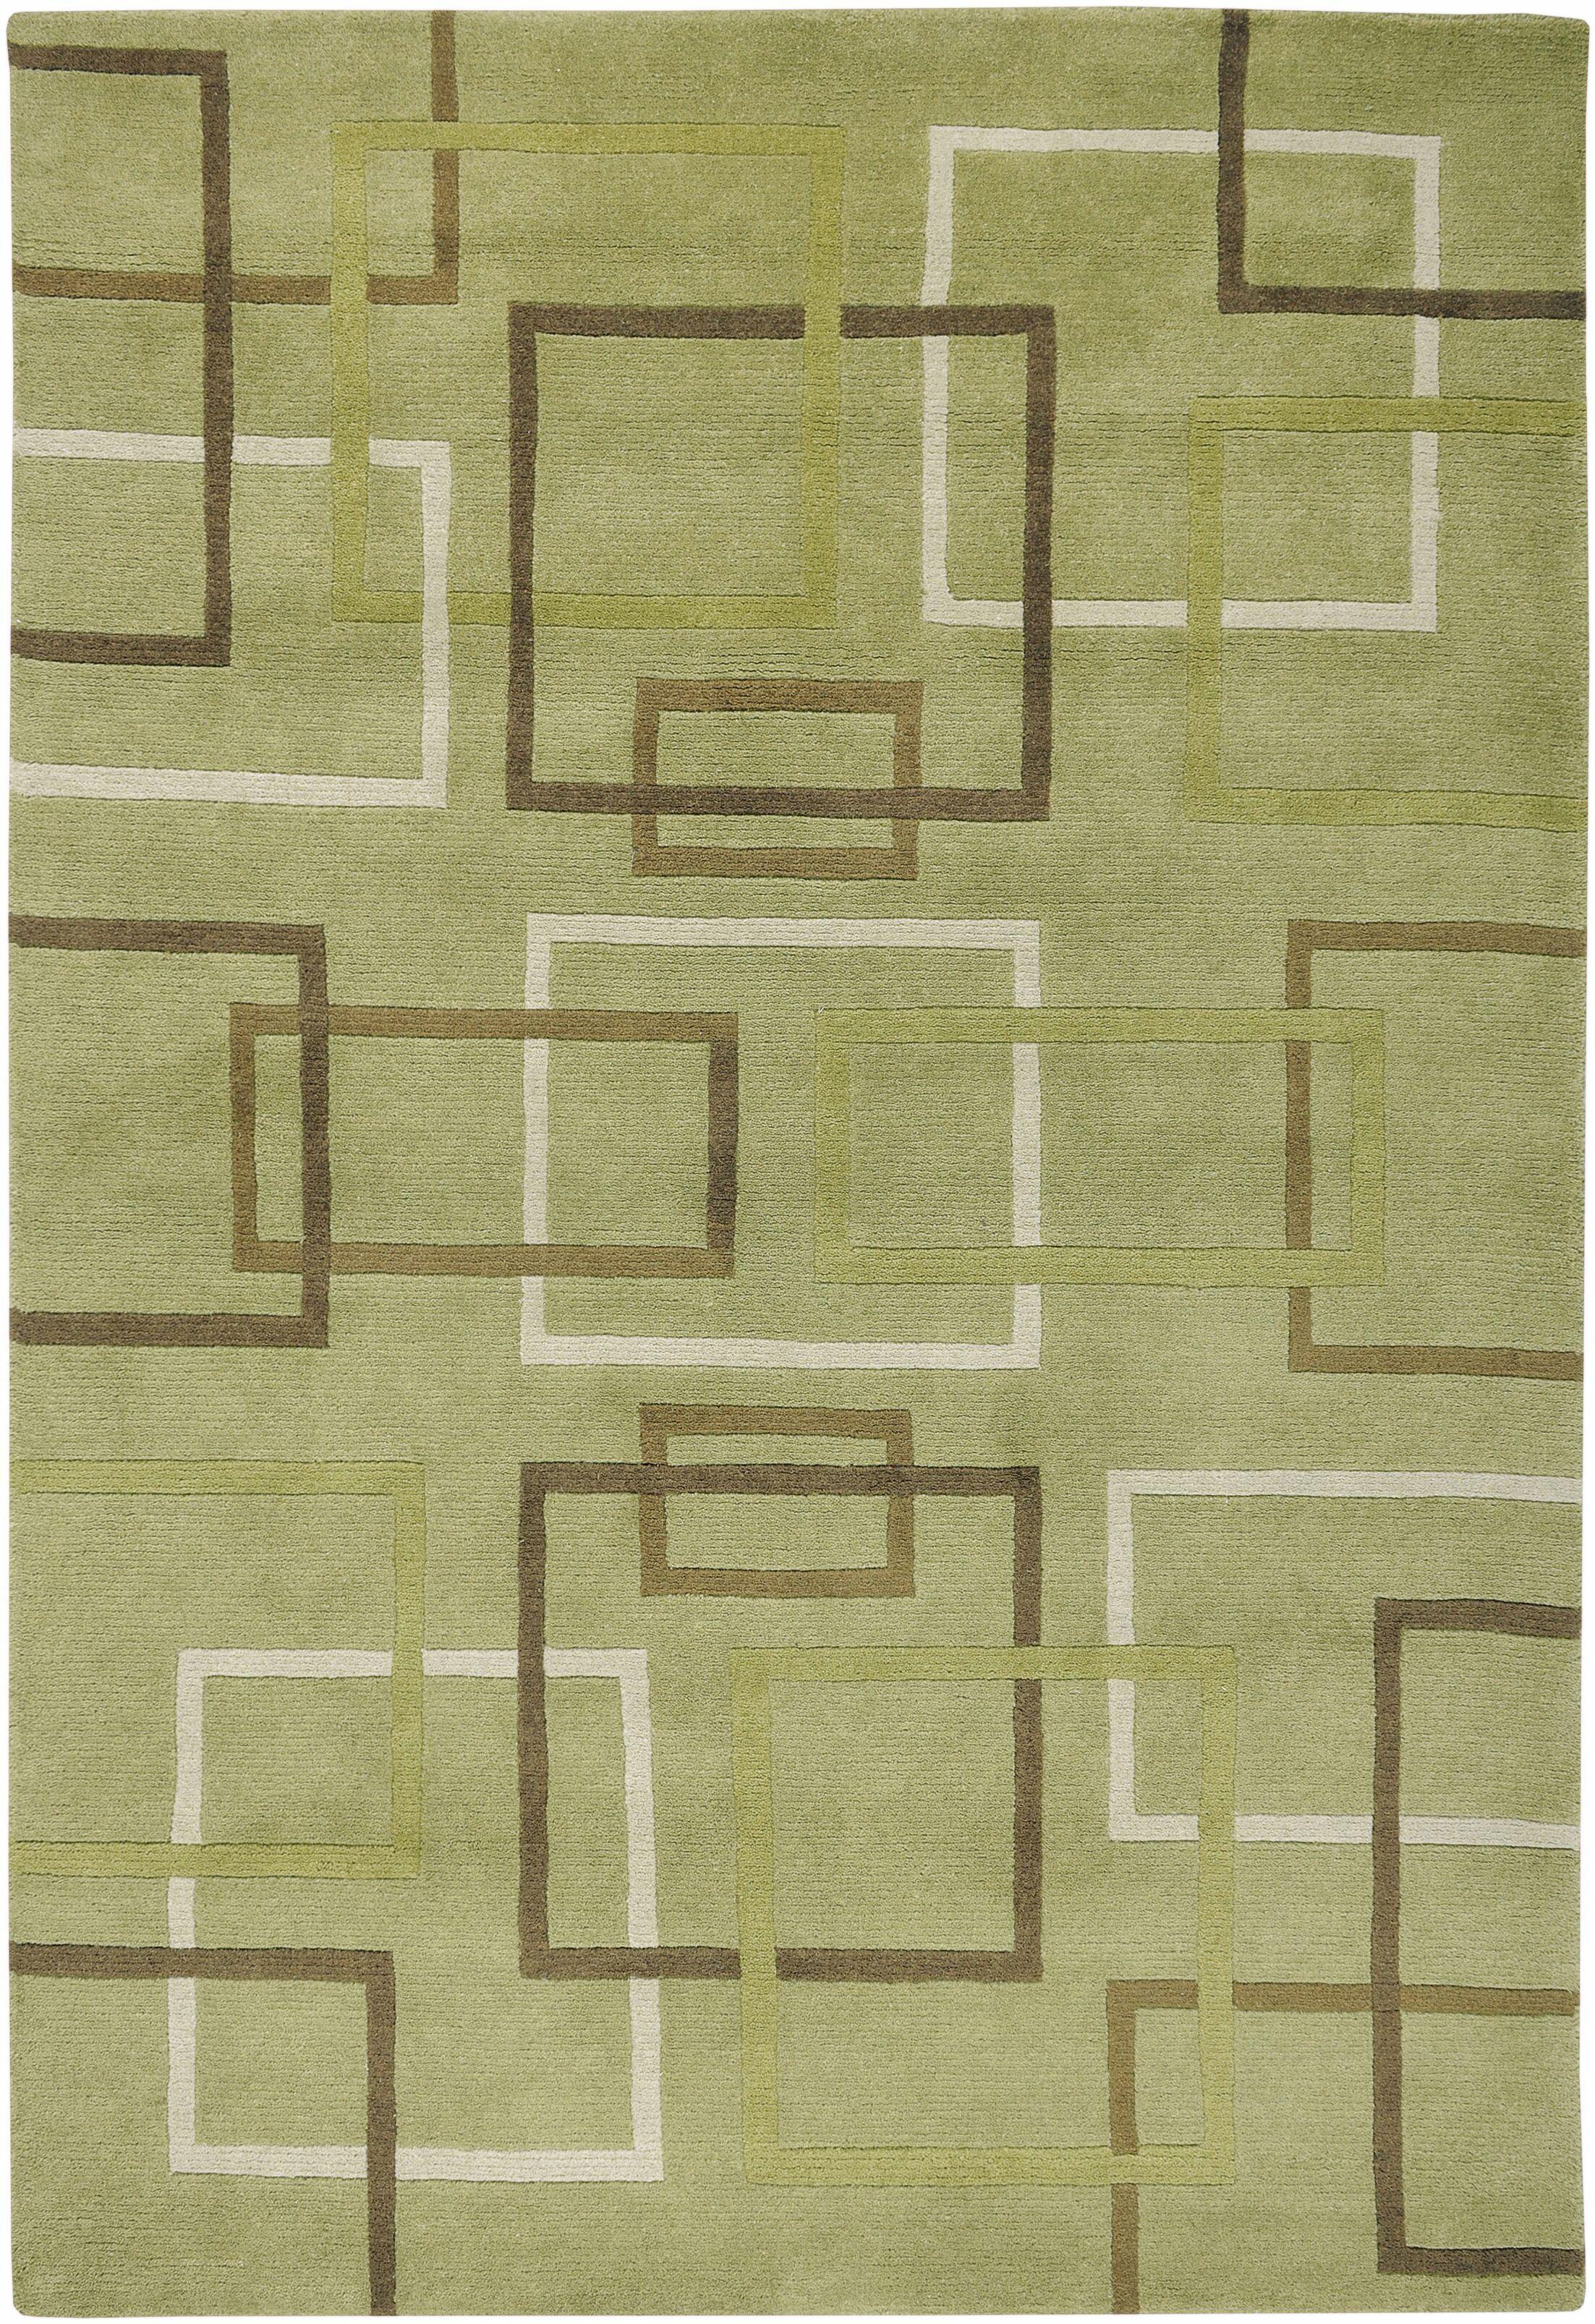 Dakar Hand-Knotted Lime Area Rug Rug Size: Rectangle 9' x 12'